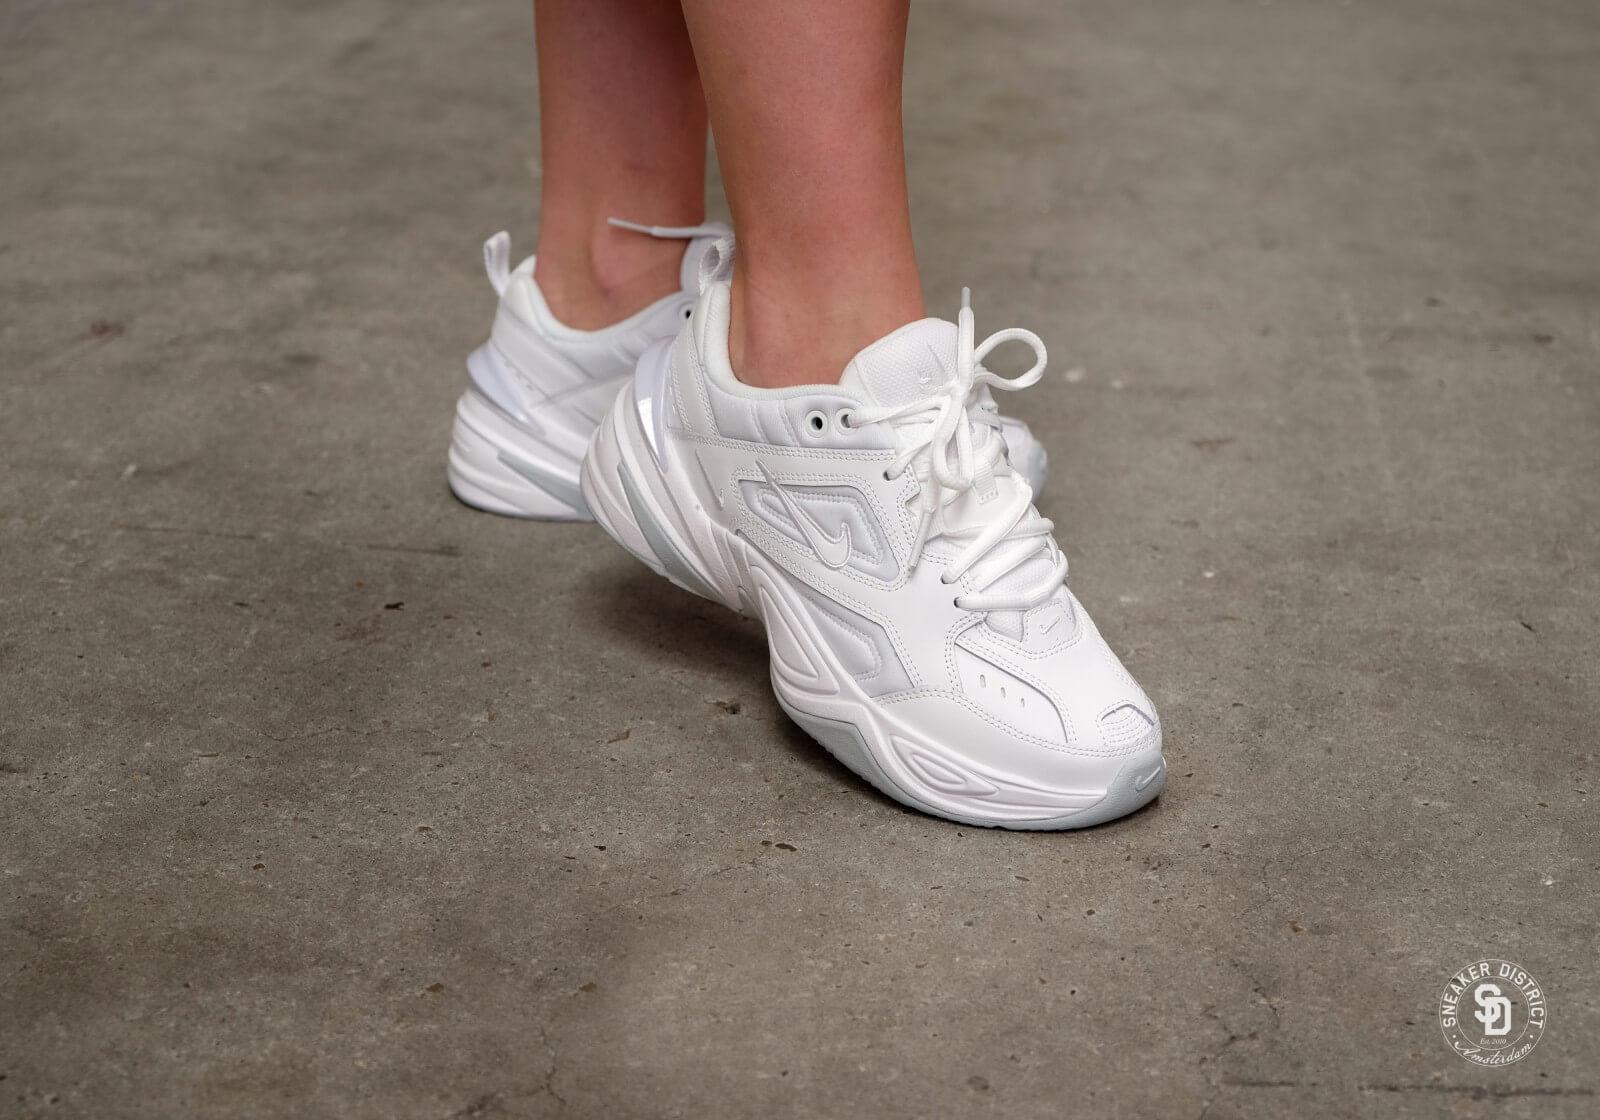 Nike Phantom Vision Fussballschuhe Schuhe Herren Cortexpower